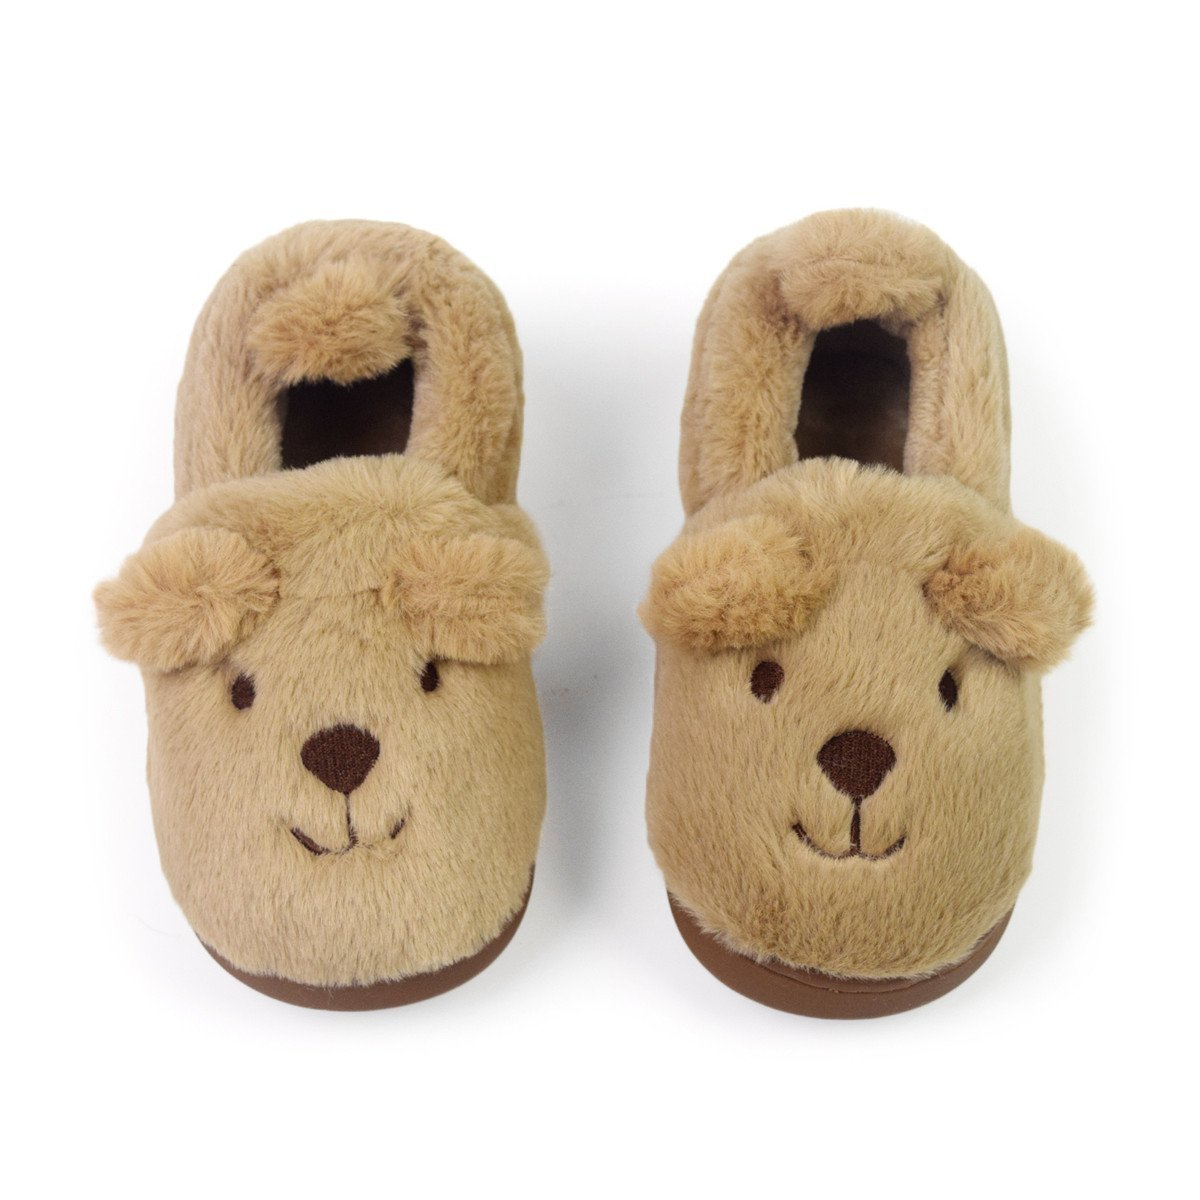 Toddler Girls Boys Slipper Shoes For Kids Cute Cartoon Warm Winter Non-Slip Bedroom Indoor House Slipper Comfort Home Shoes